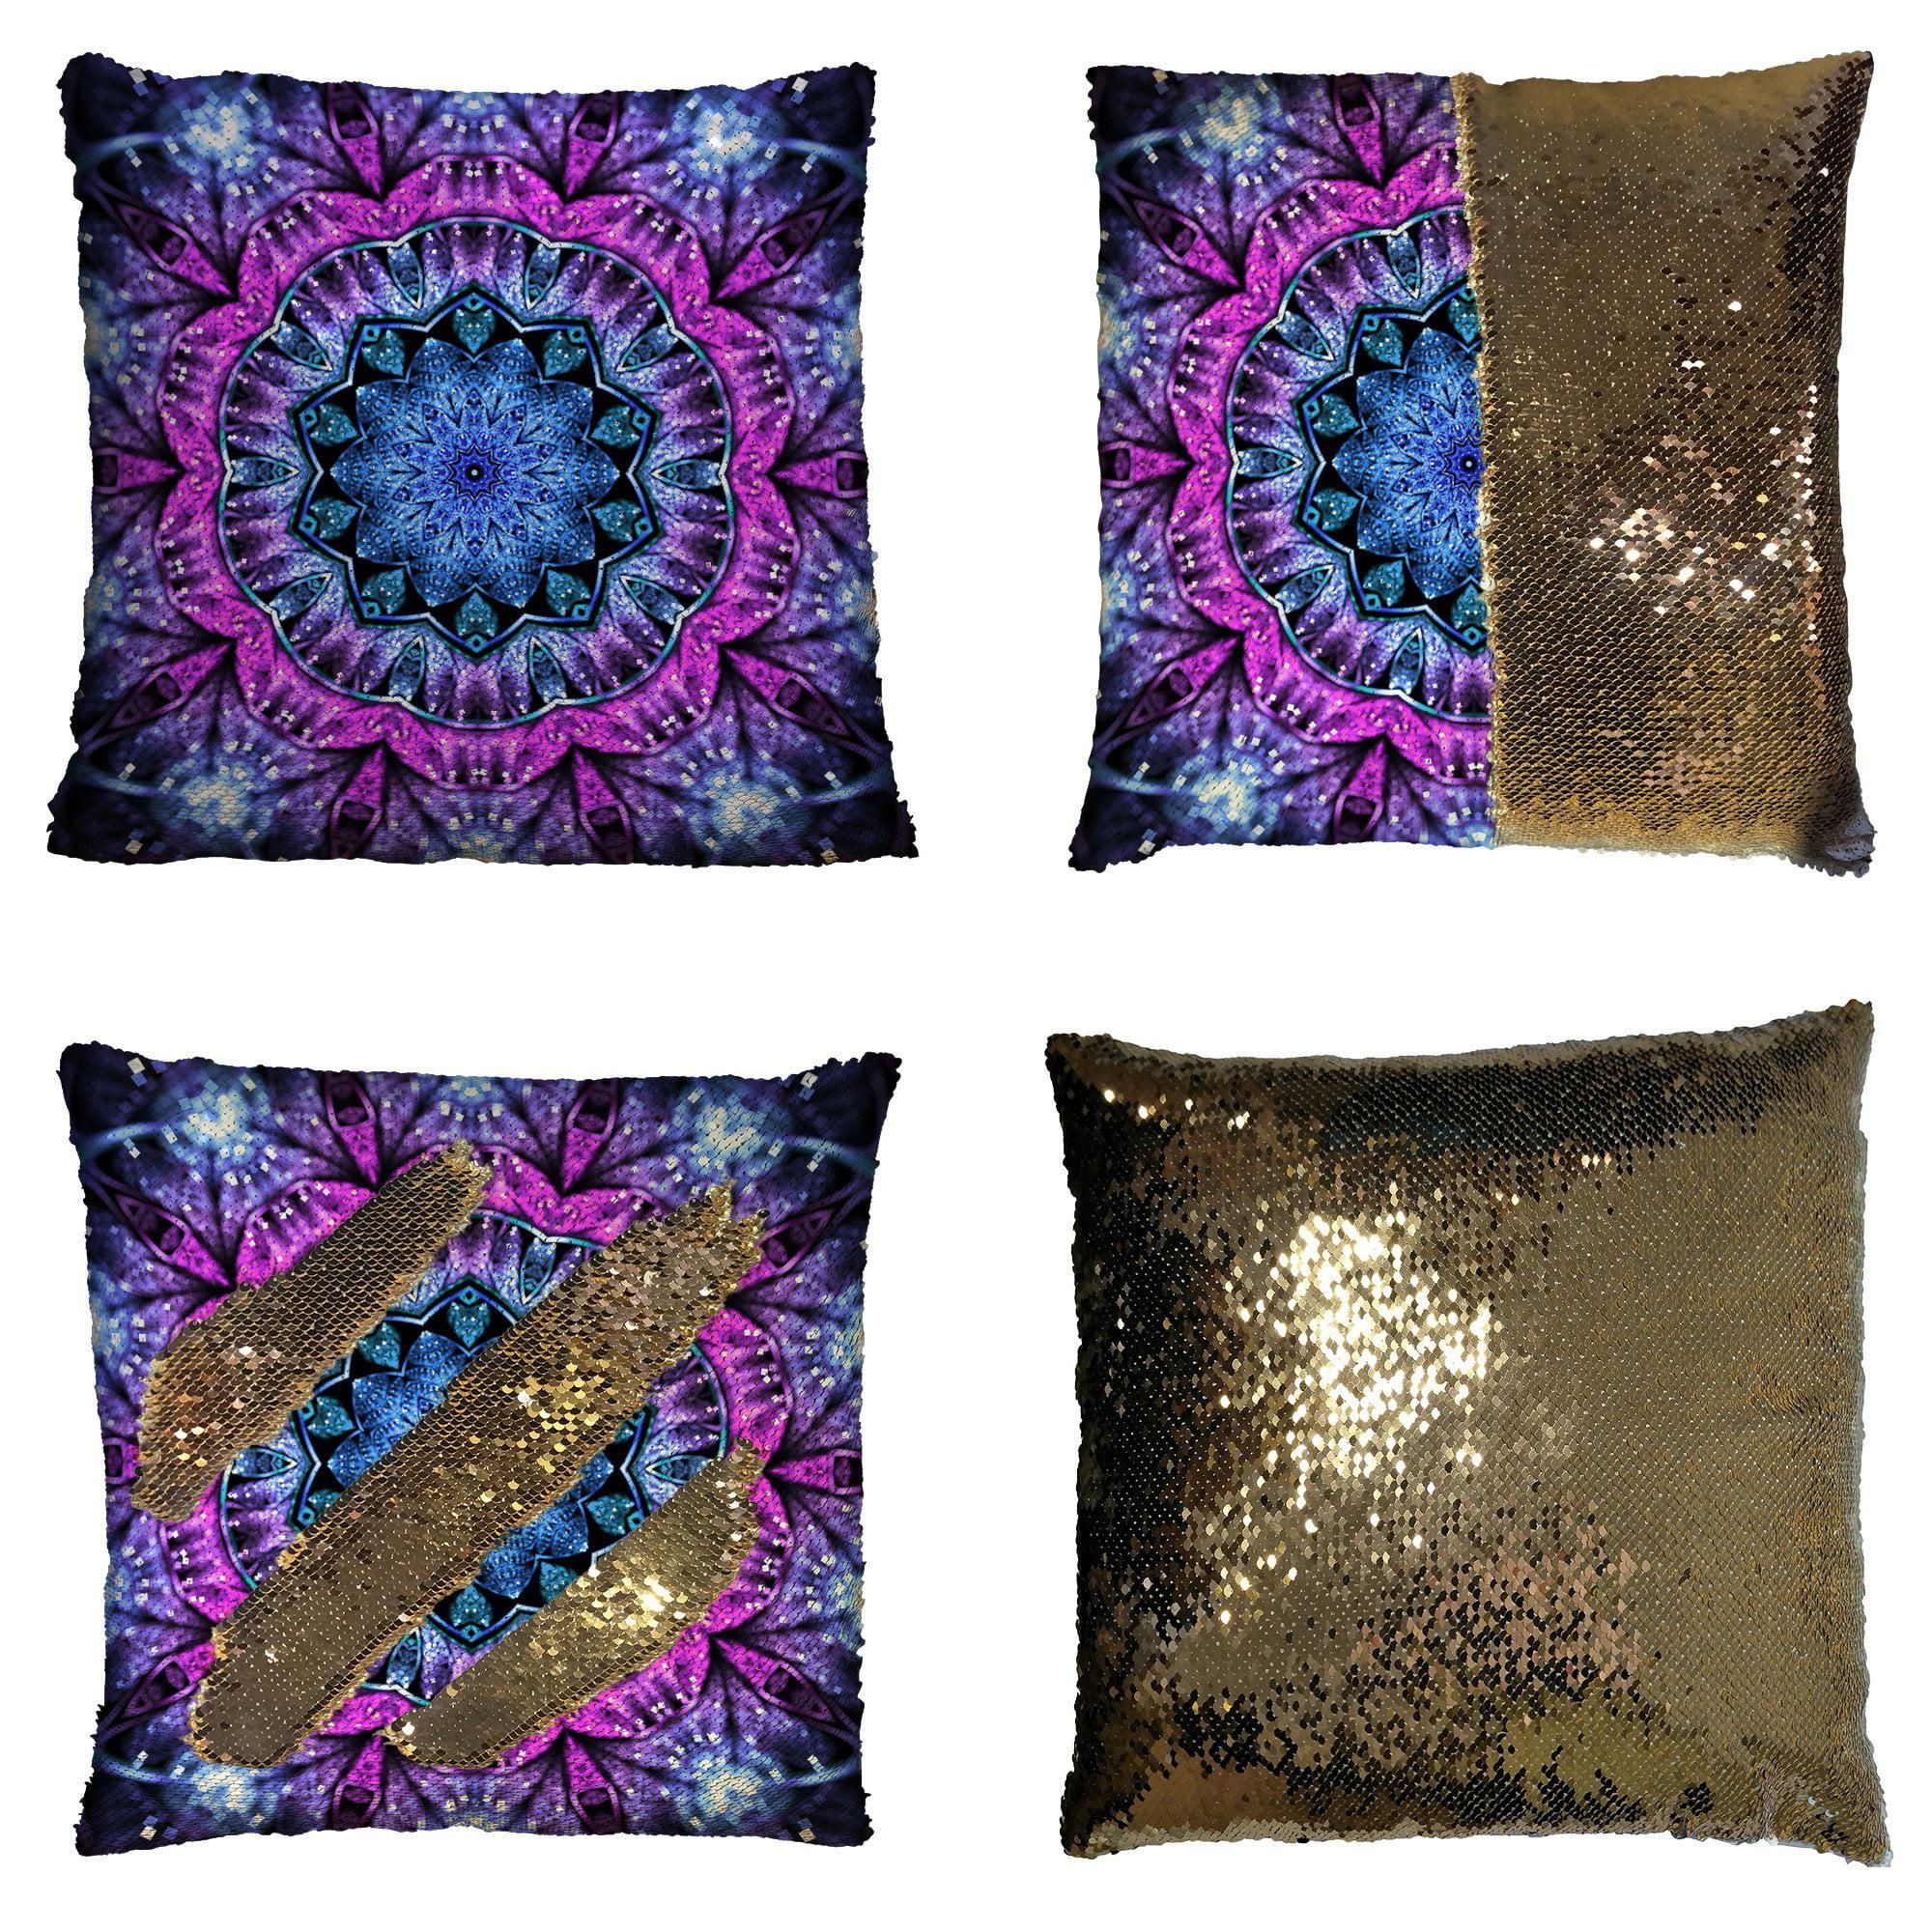 GCKG Floral Art Pillowcase, Glossy Blue and Purple Fractal Mandala Reversible Mermaid Sequin Pillow Case Home Decor Cushion Cover 16x16 inches